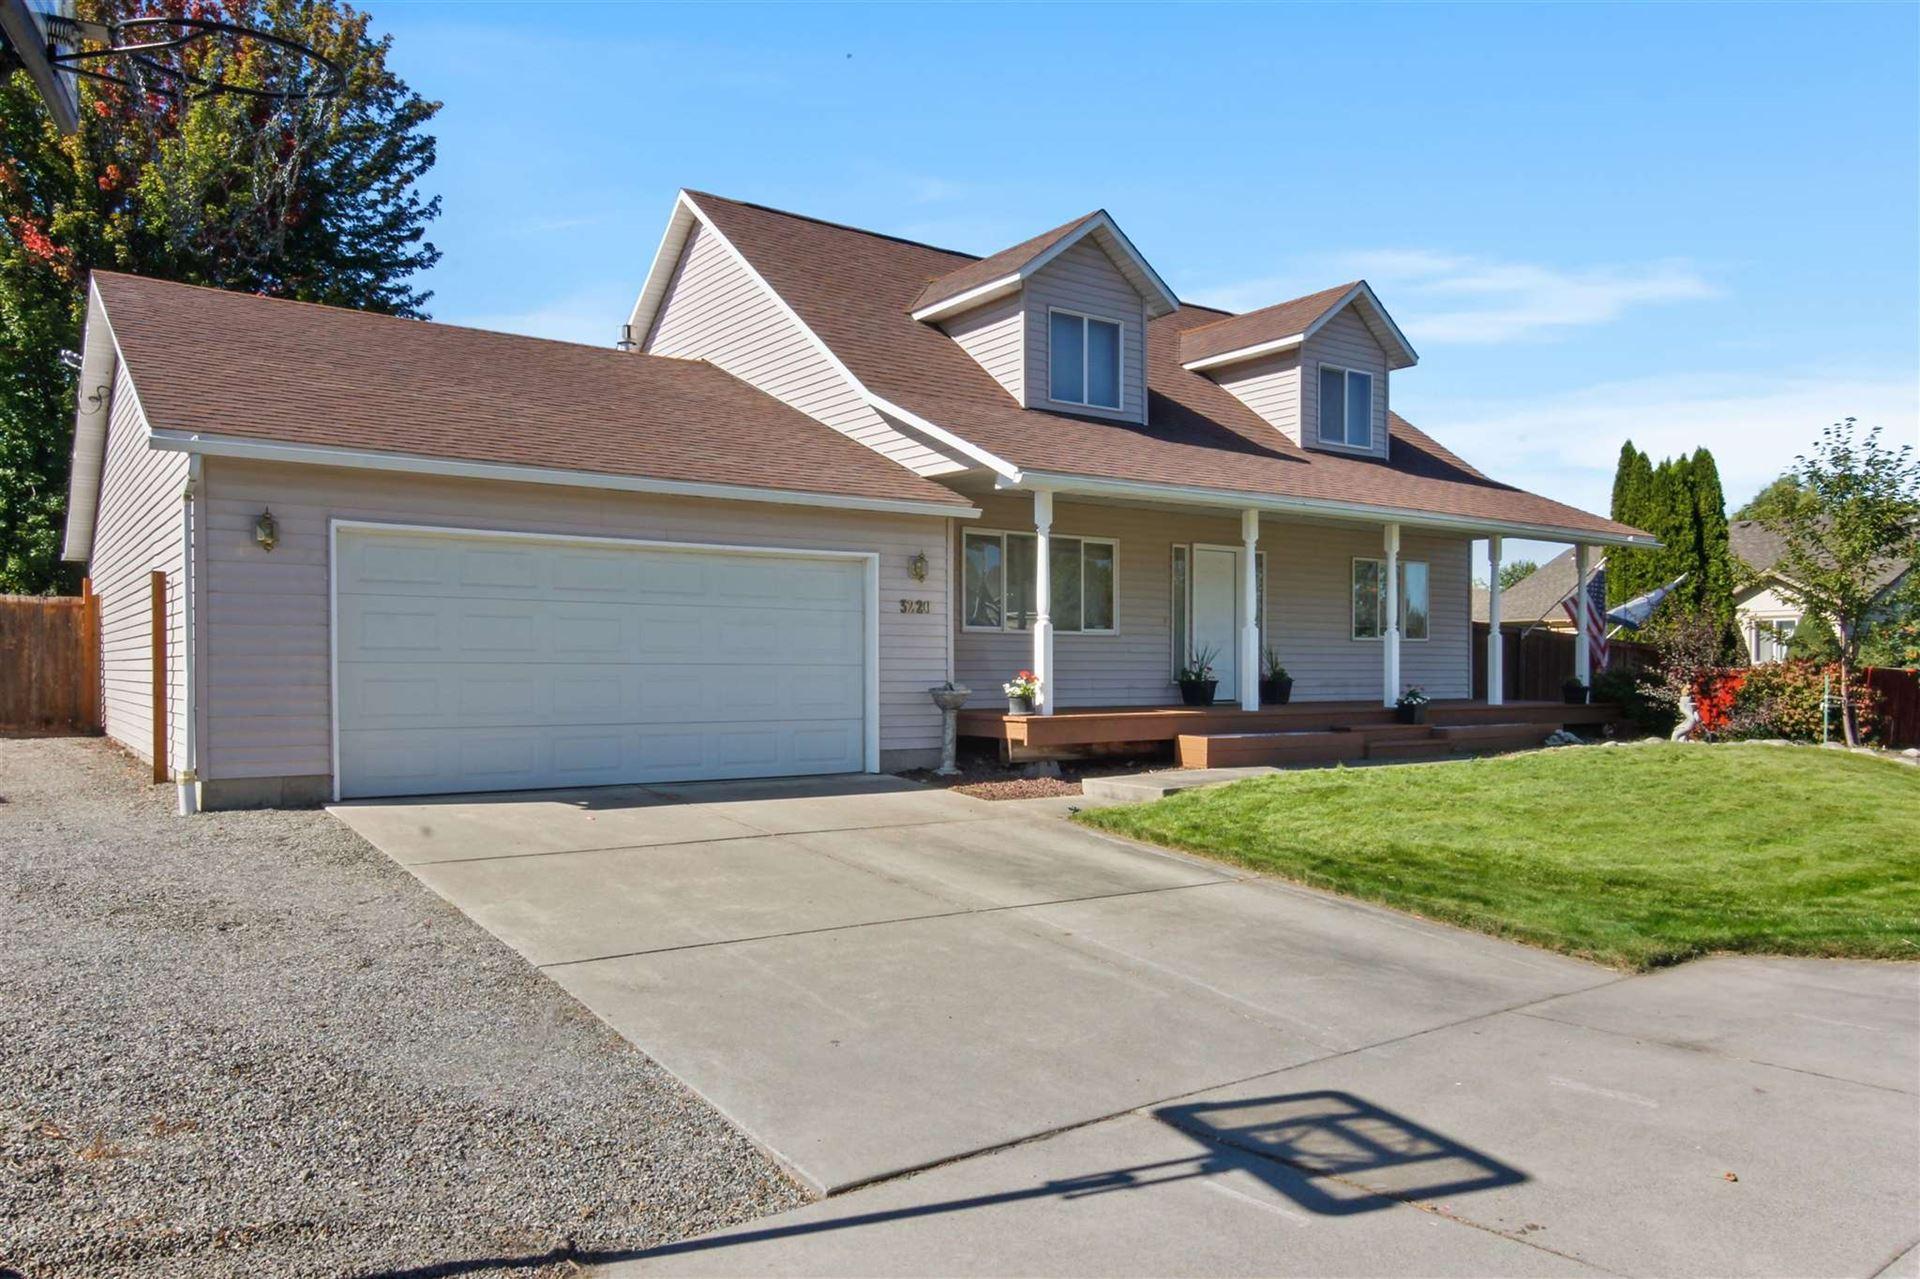 3220 S Woodlawn Dr, Spokane Valley, WA 99216 - #: 202123649